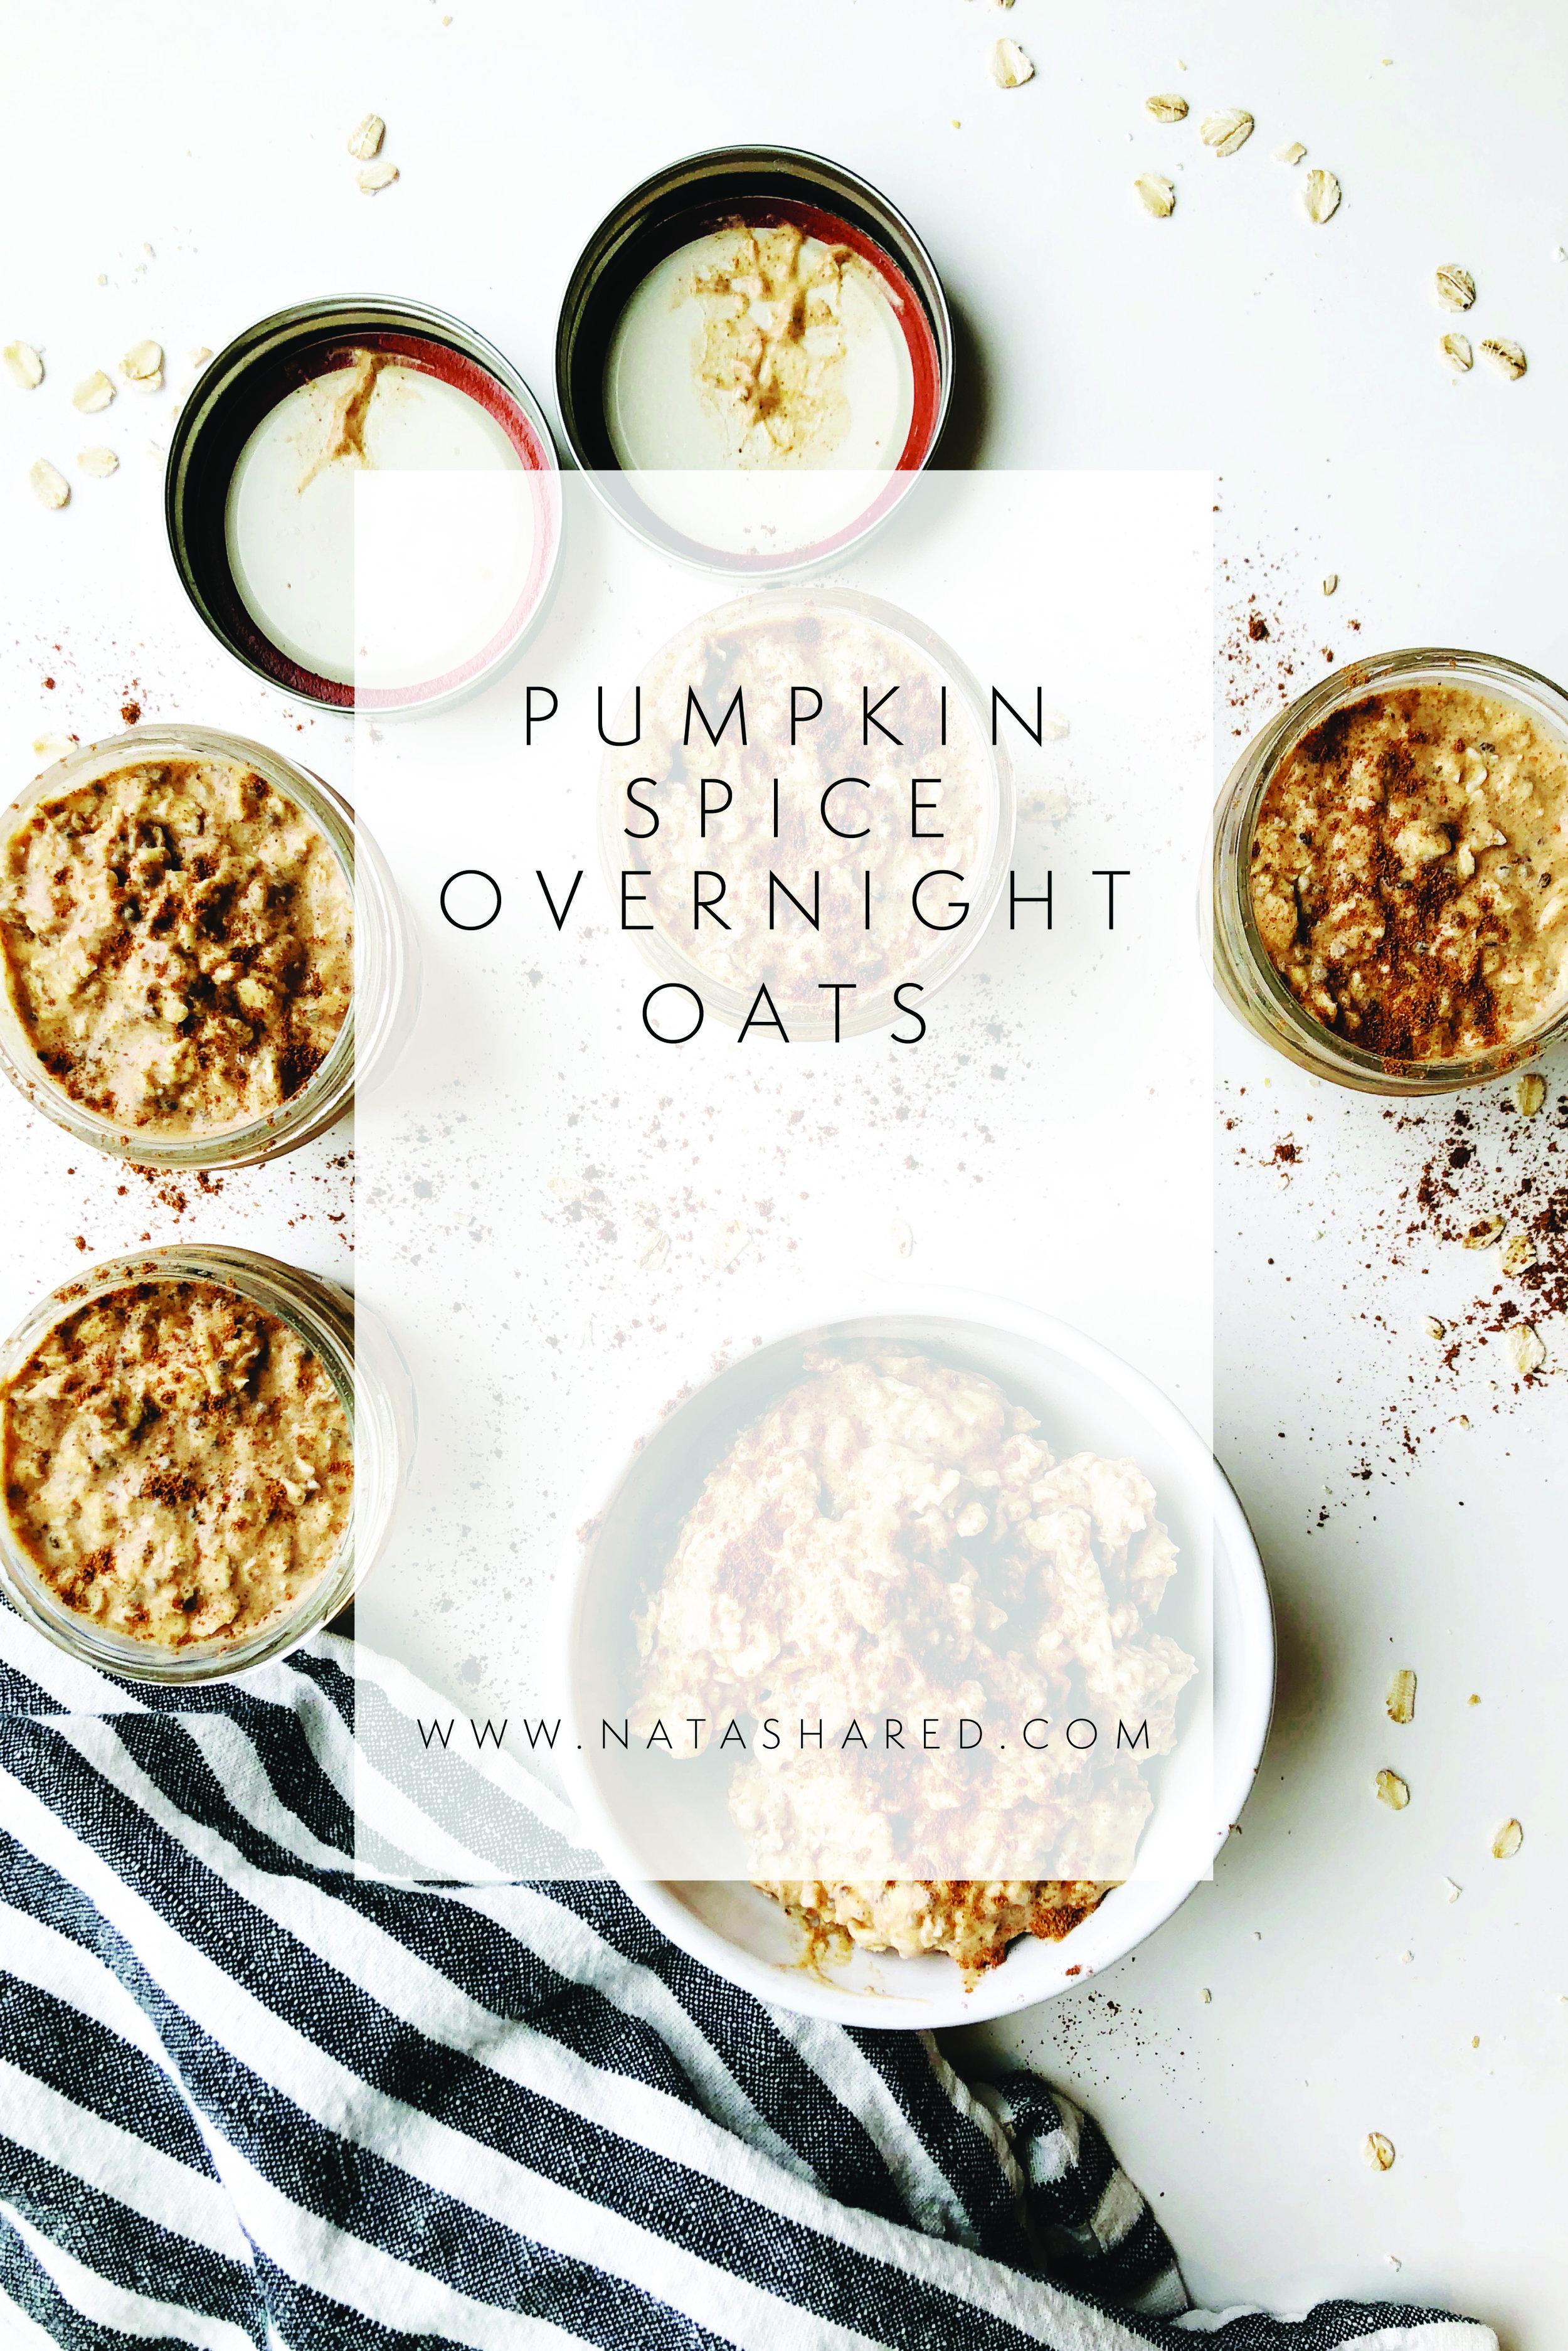 Pumpkin Spice Overnight Oats | Overnight Oats Club